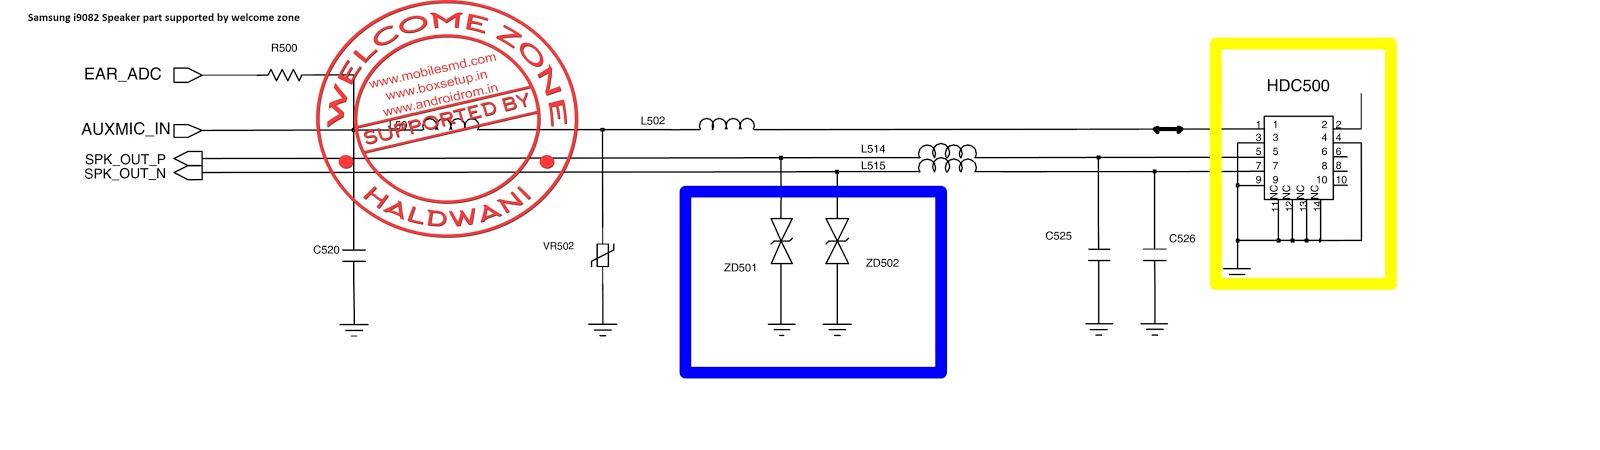 Samsung Galaxy Grand I9082 Ringer Speaker Part Not Working Solution